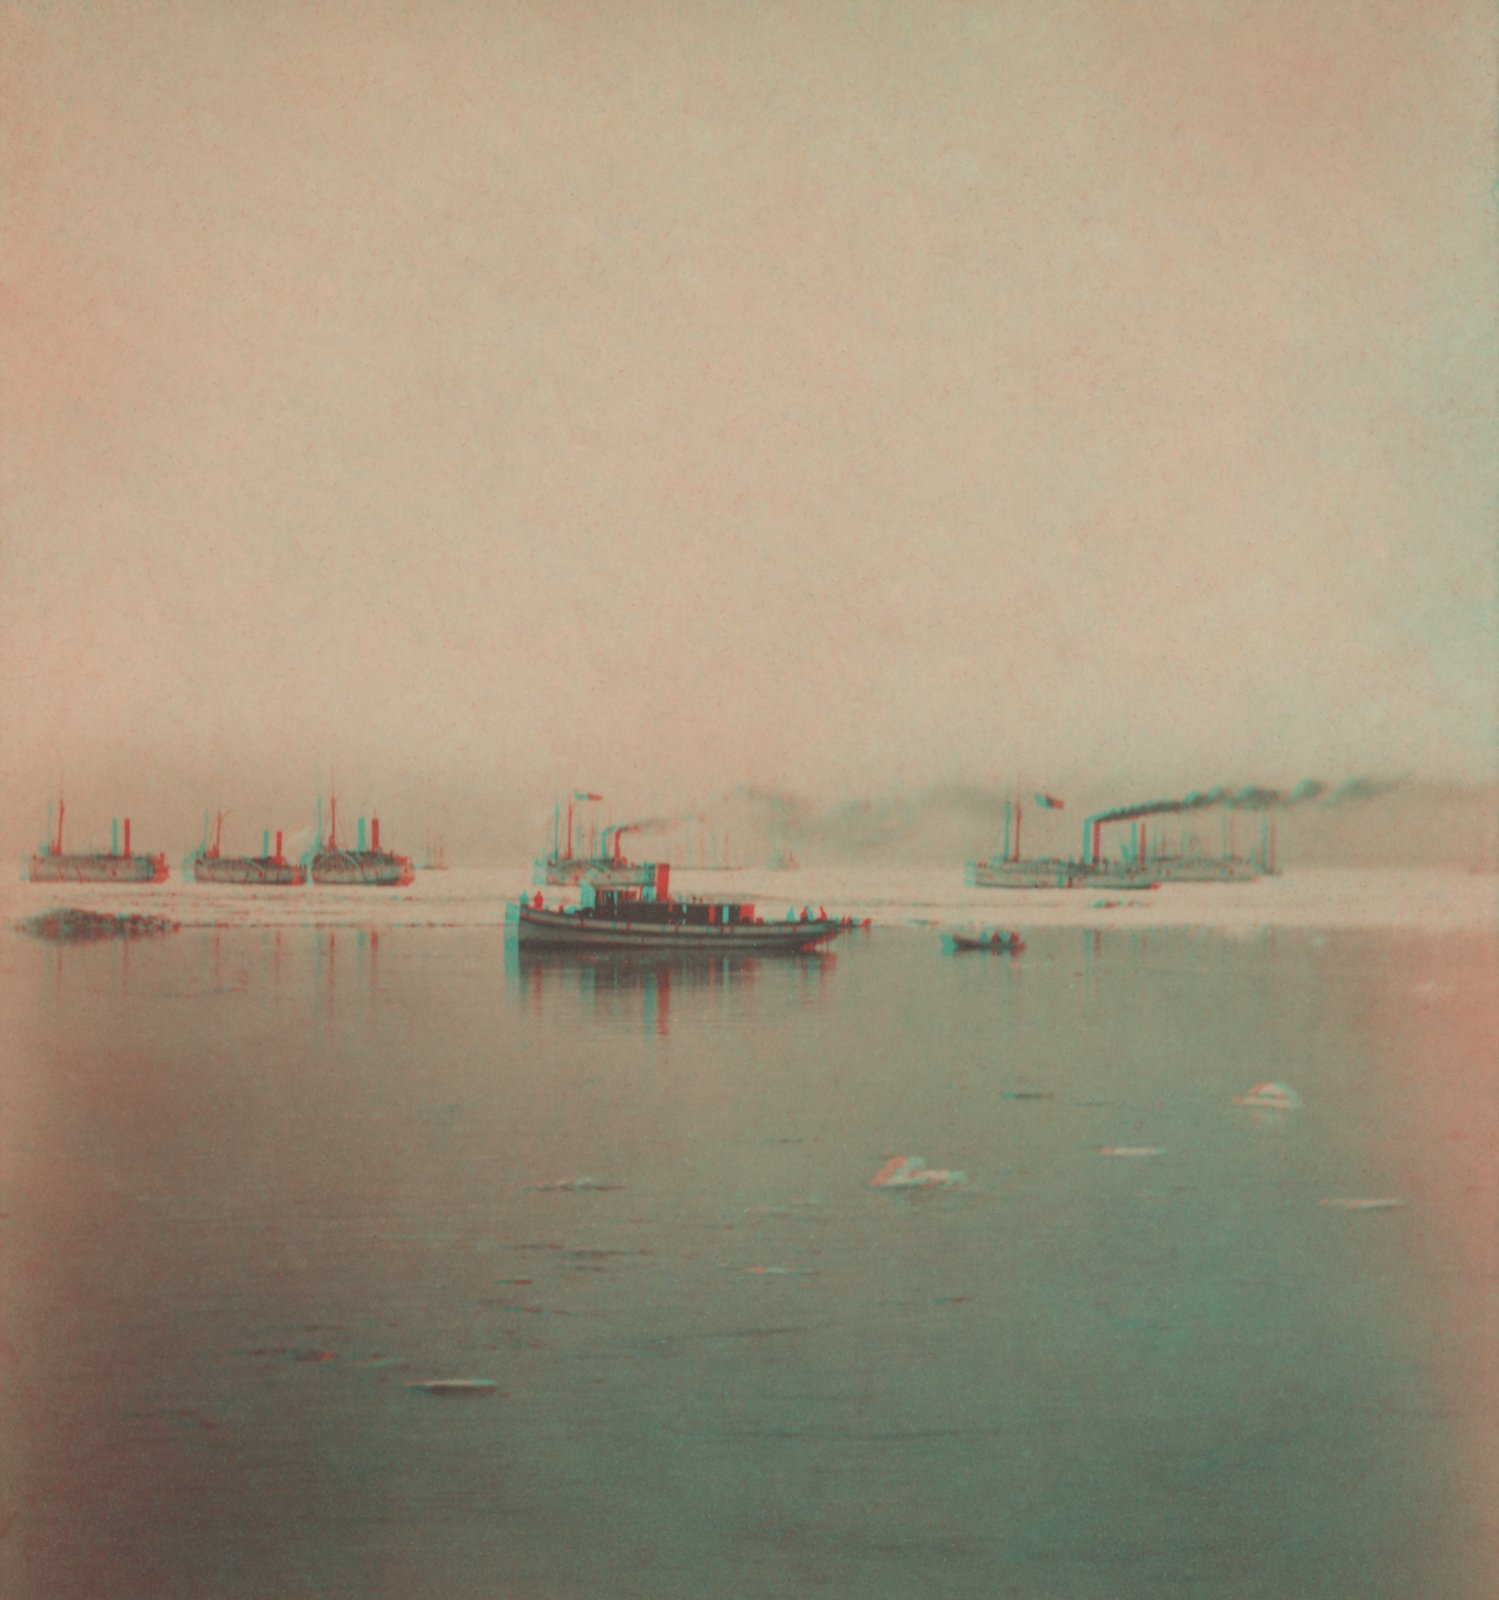 Six ice bound Propellers off Buffalo Light, May 4, 1867.